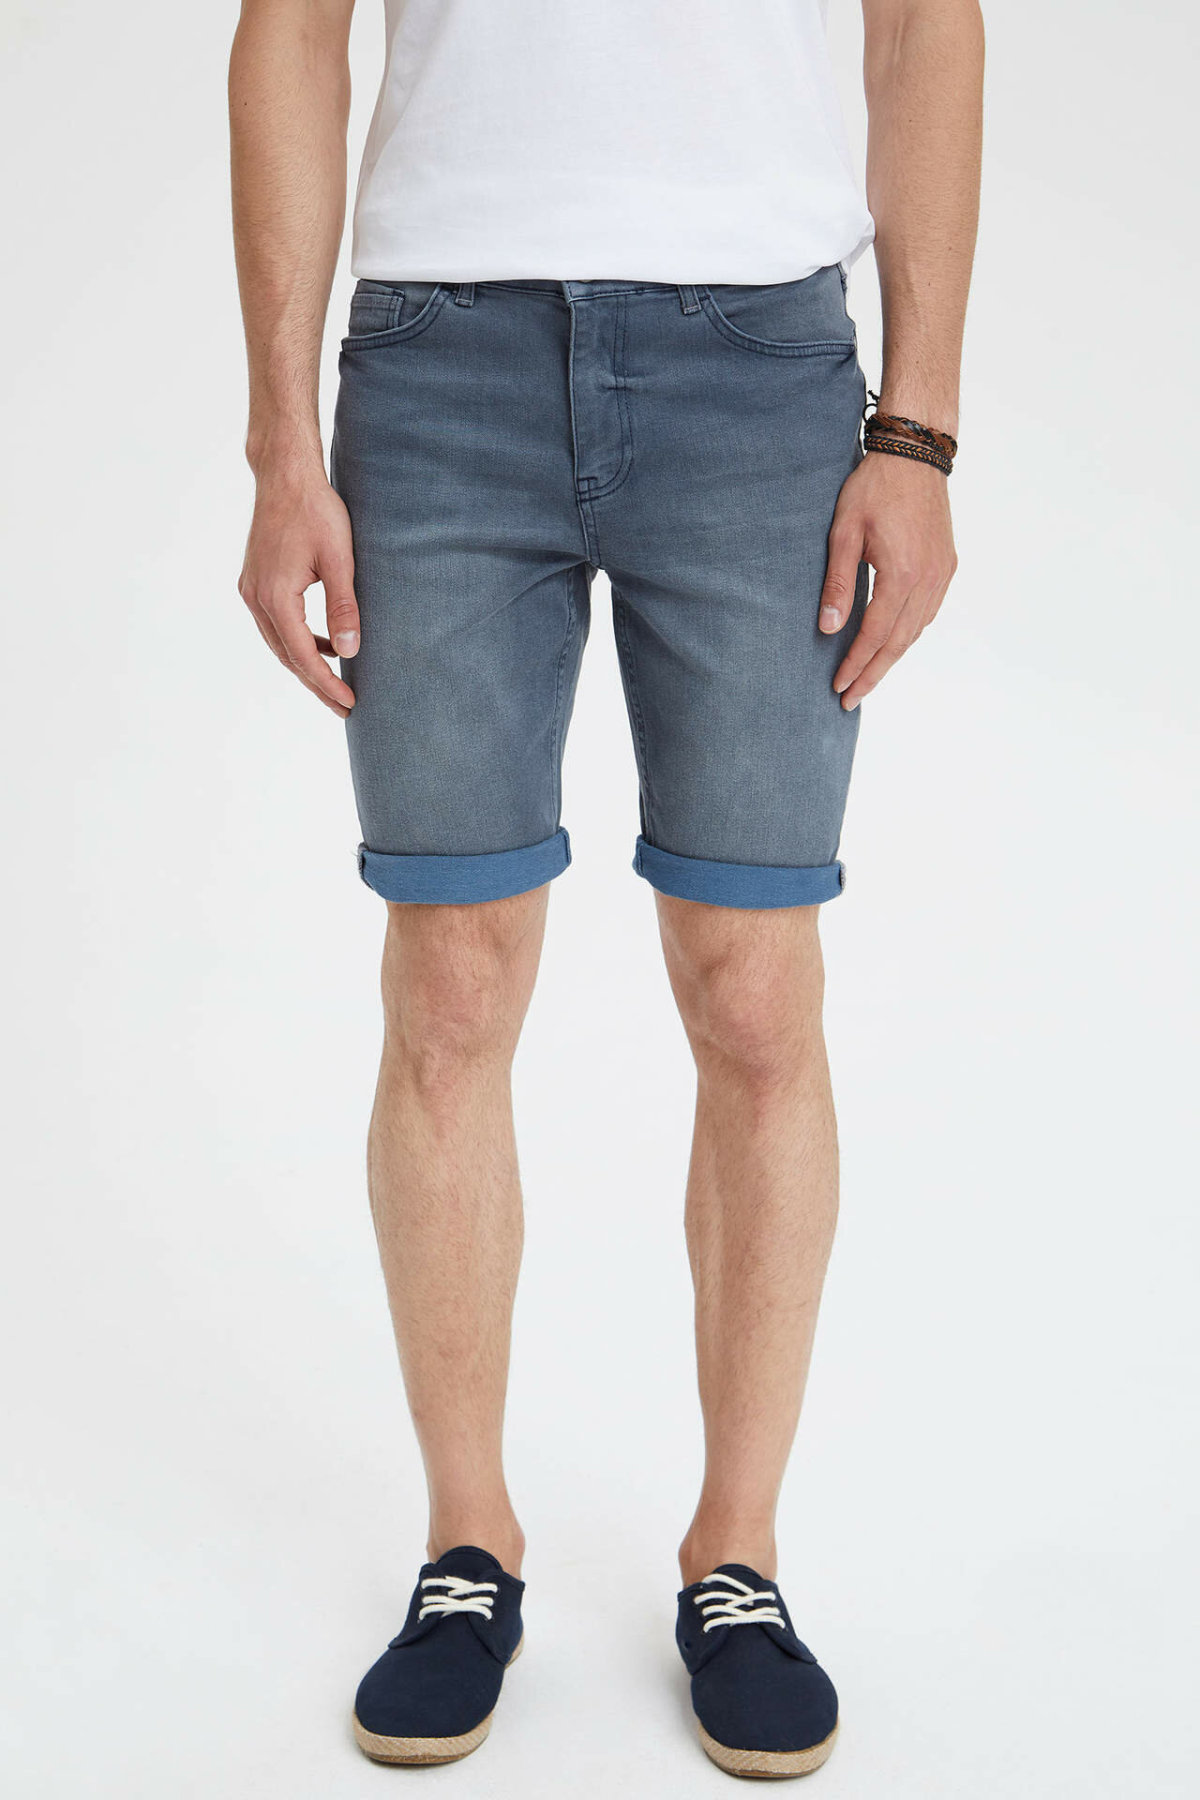 DeFacto Man Summer Denim Shorts Men Casual Fit Slim Blue Denim Jeans Male Bermuda Mid-waist Shorts-L0192AZ19SM